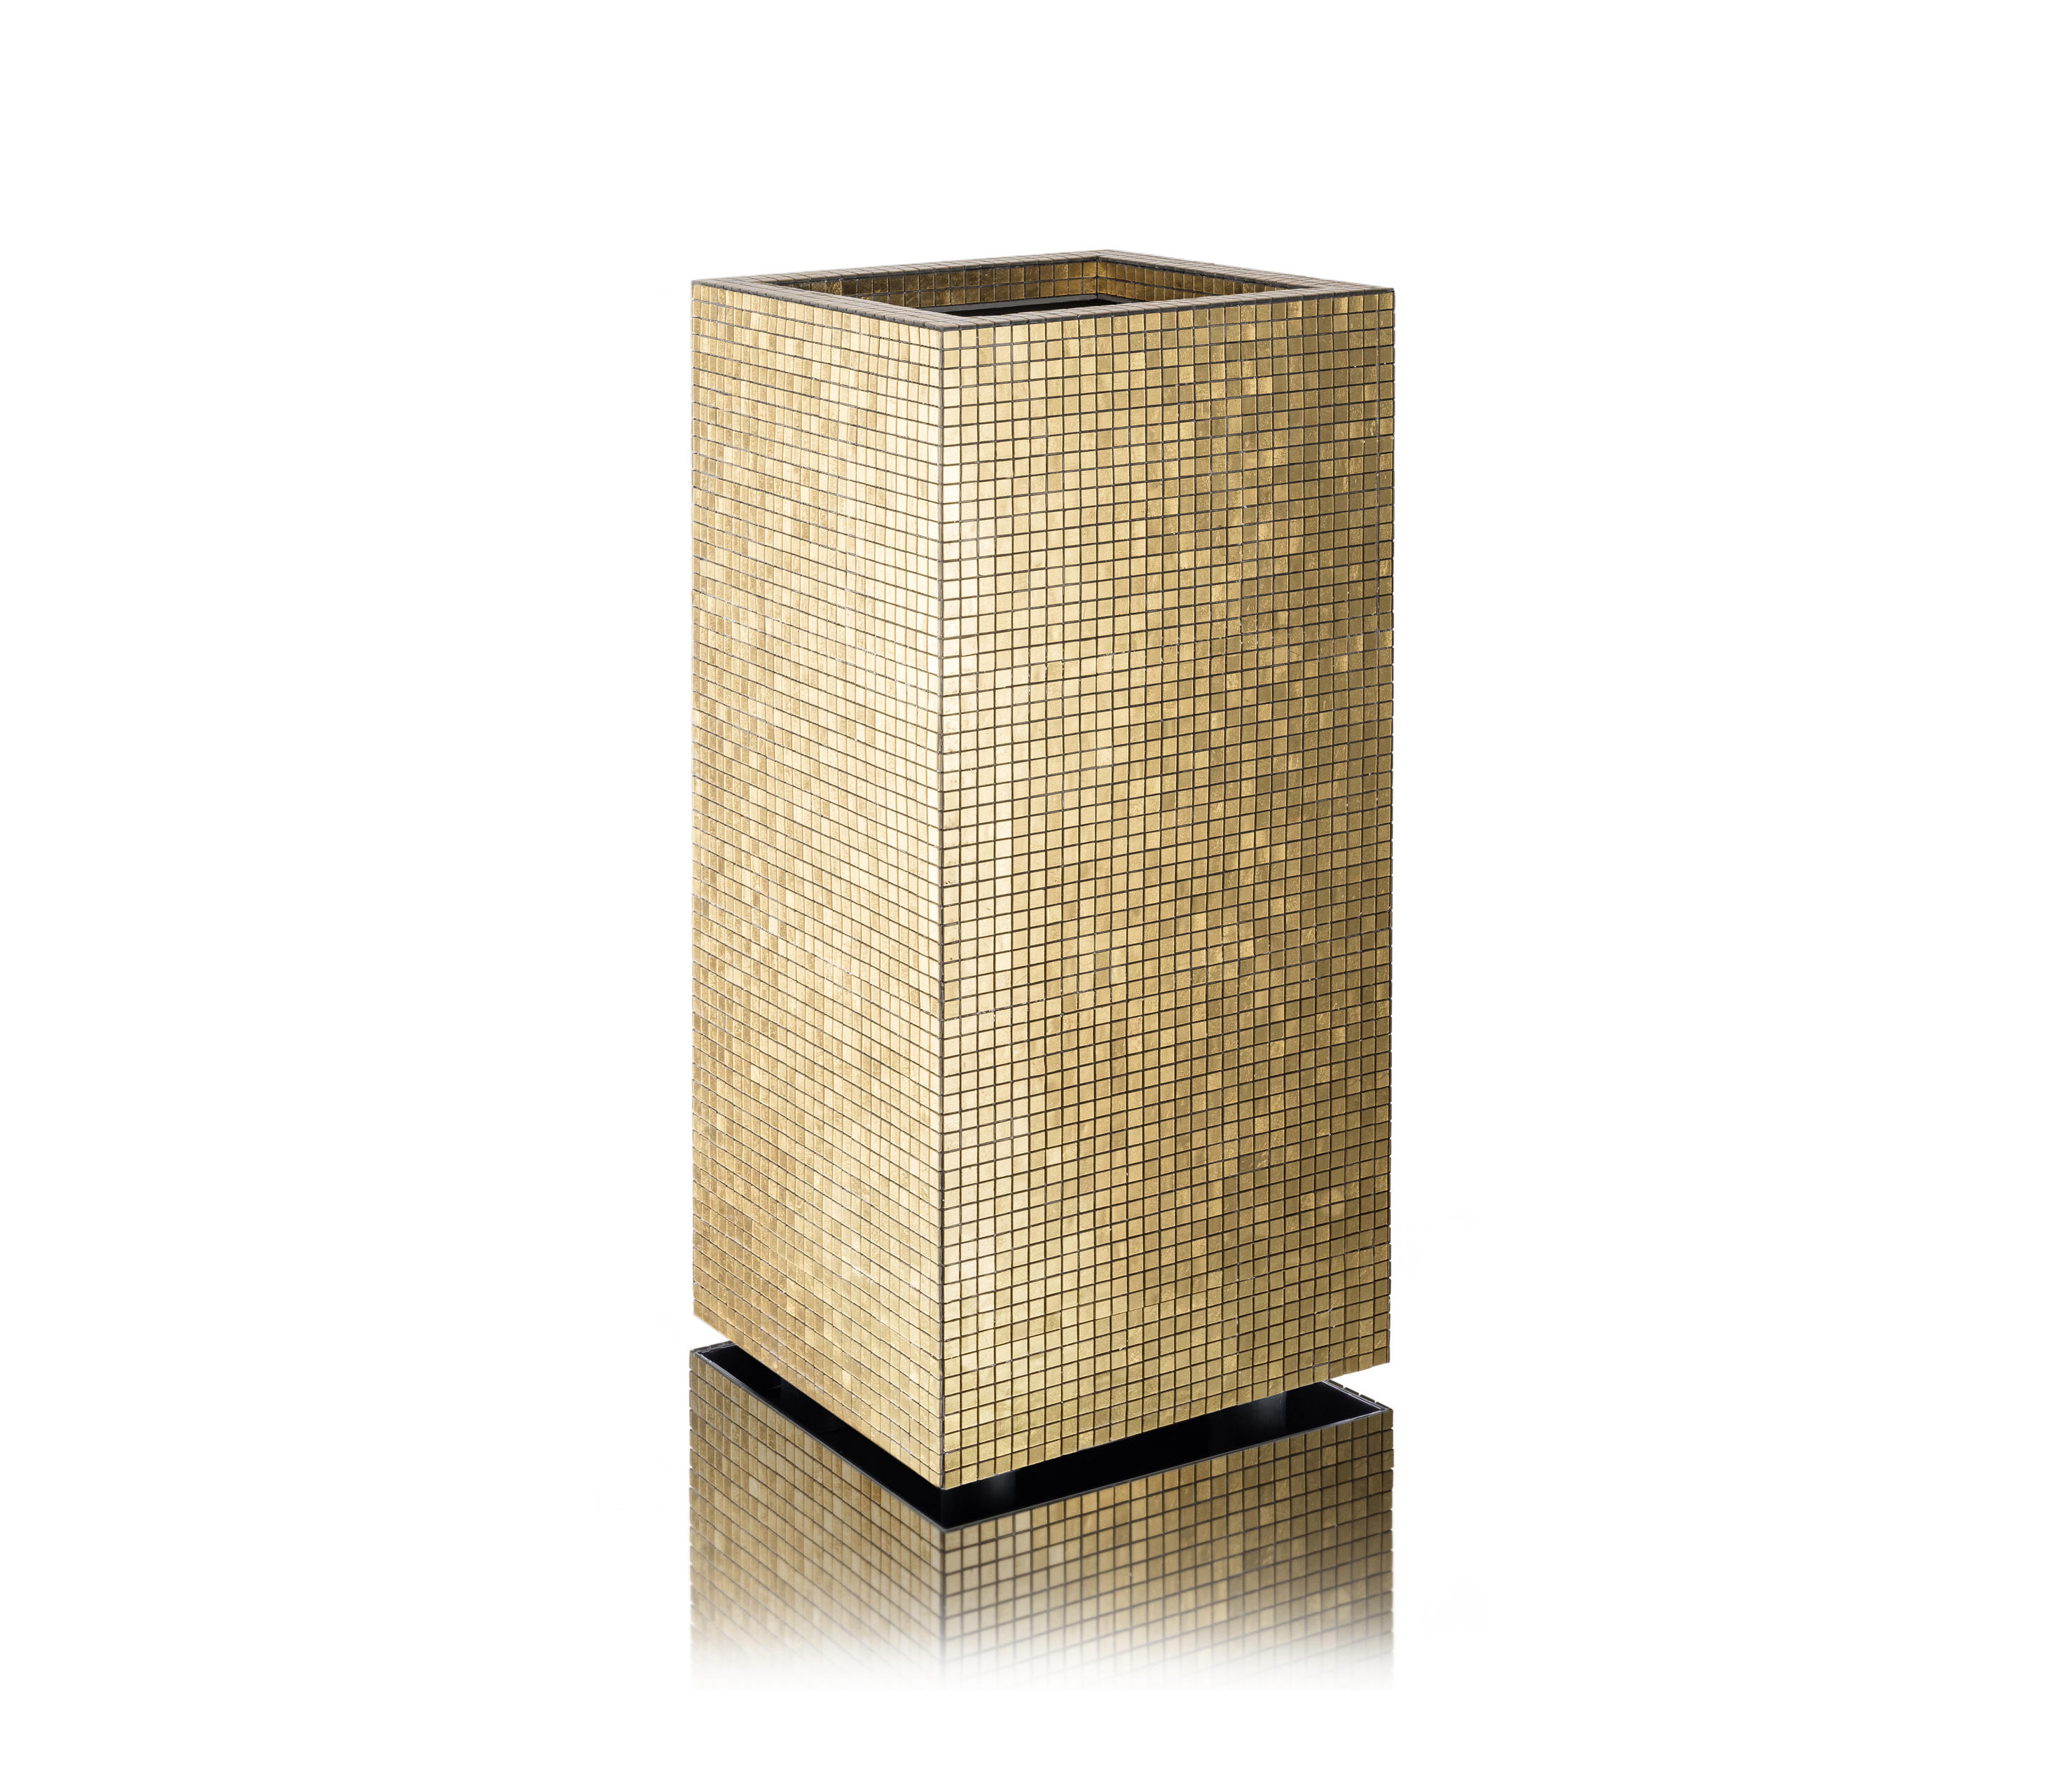 Janis fioriere metallico architonic for Foglio metallico